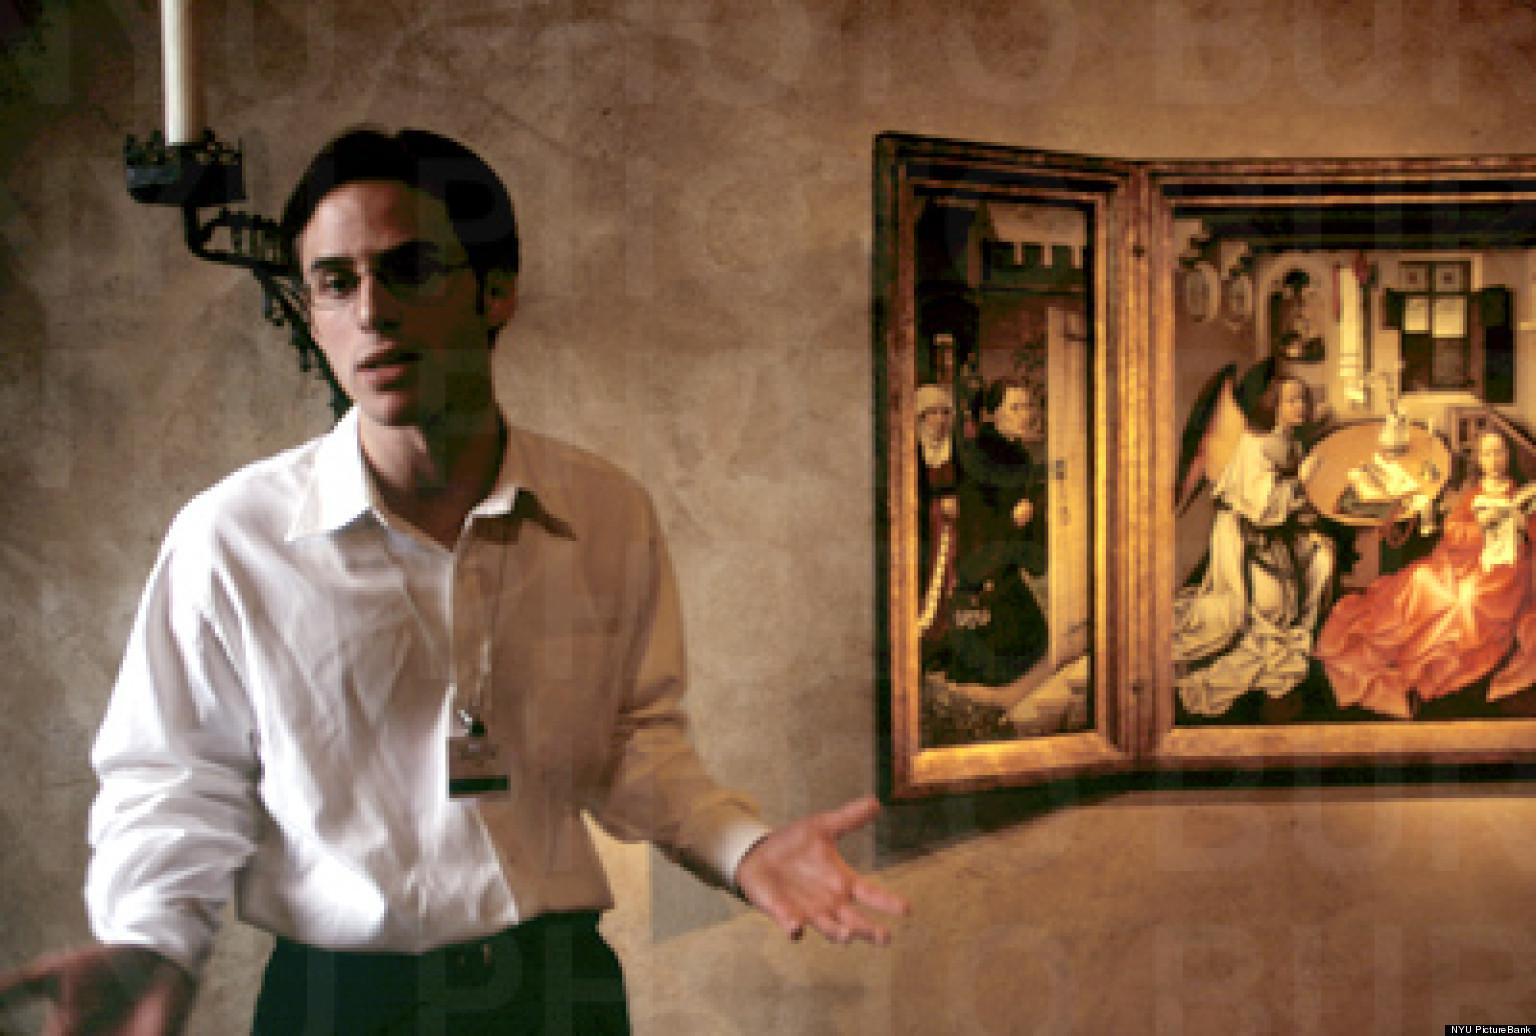 Professor Peeping Tom, I Presume?